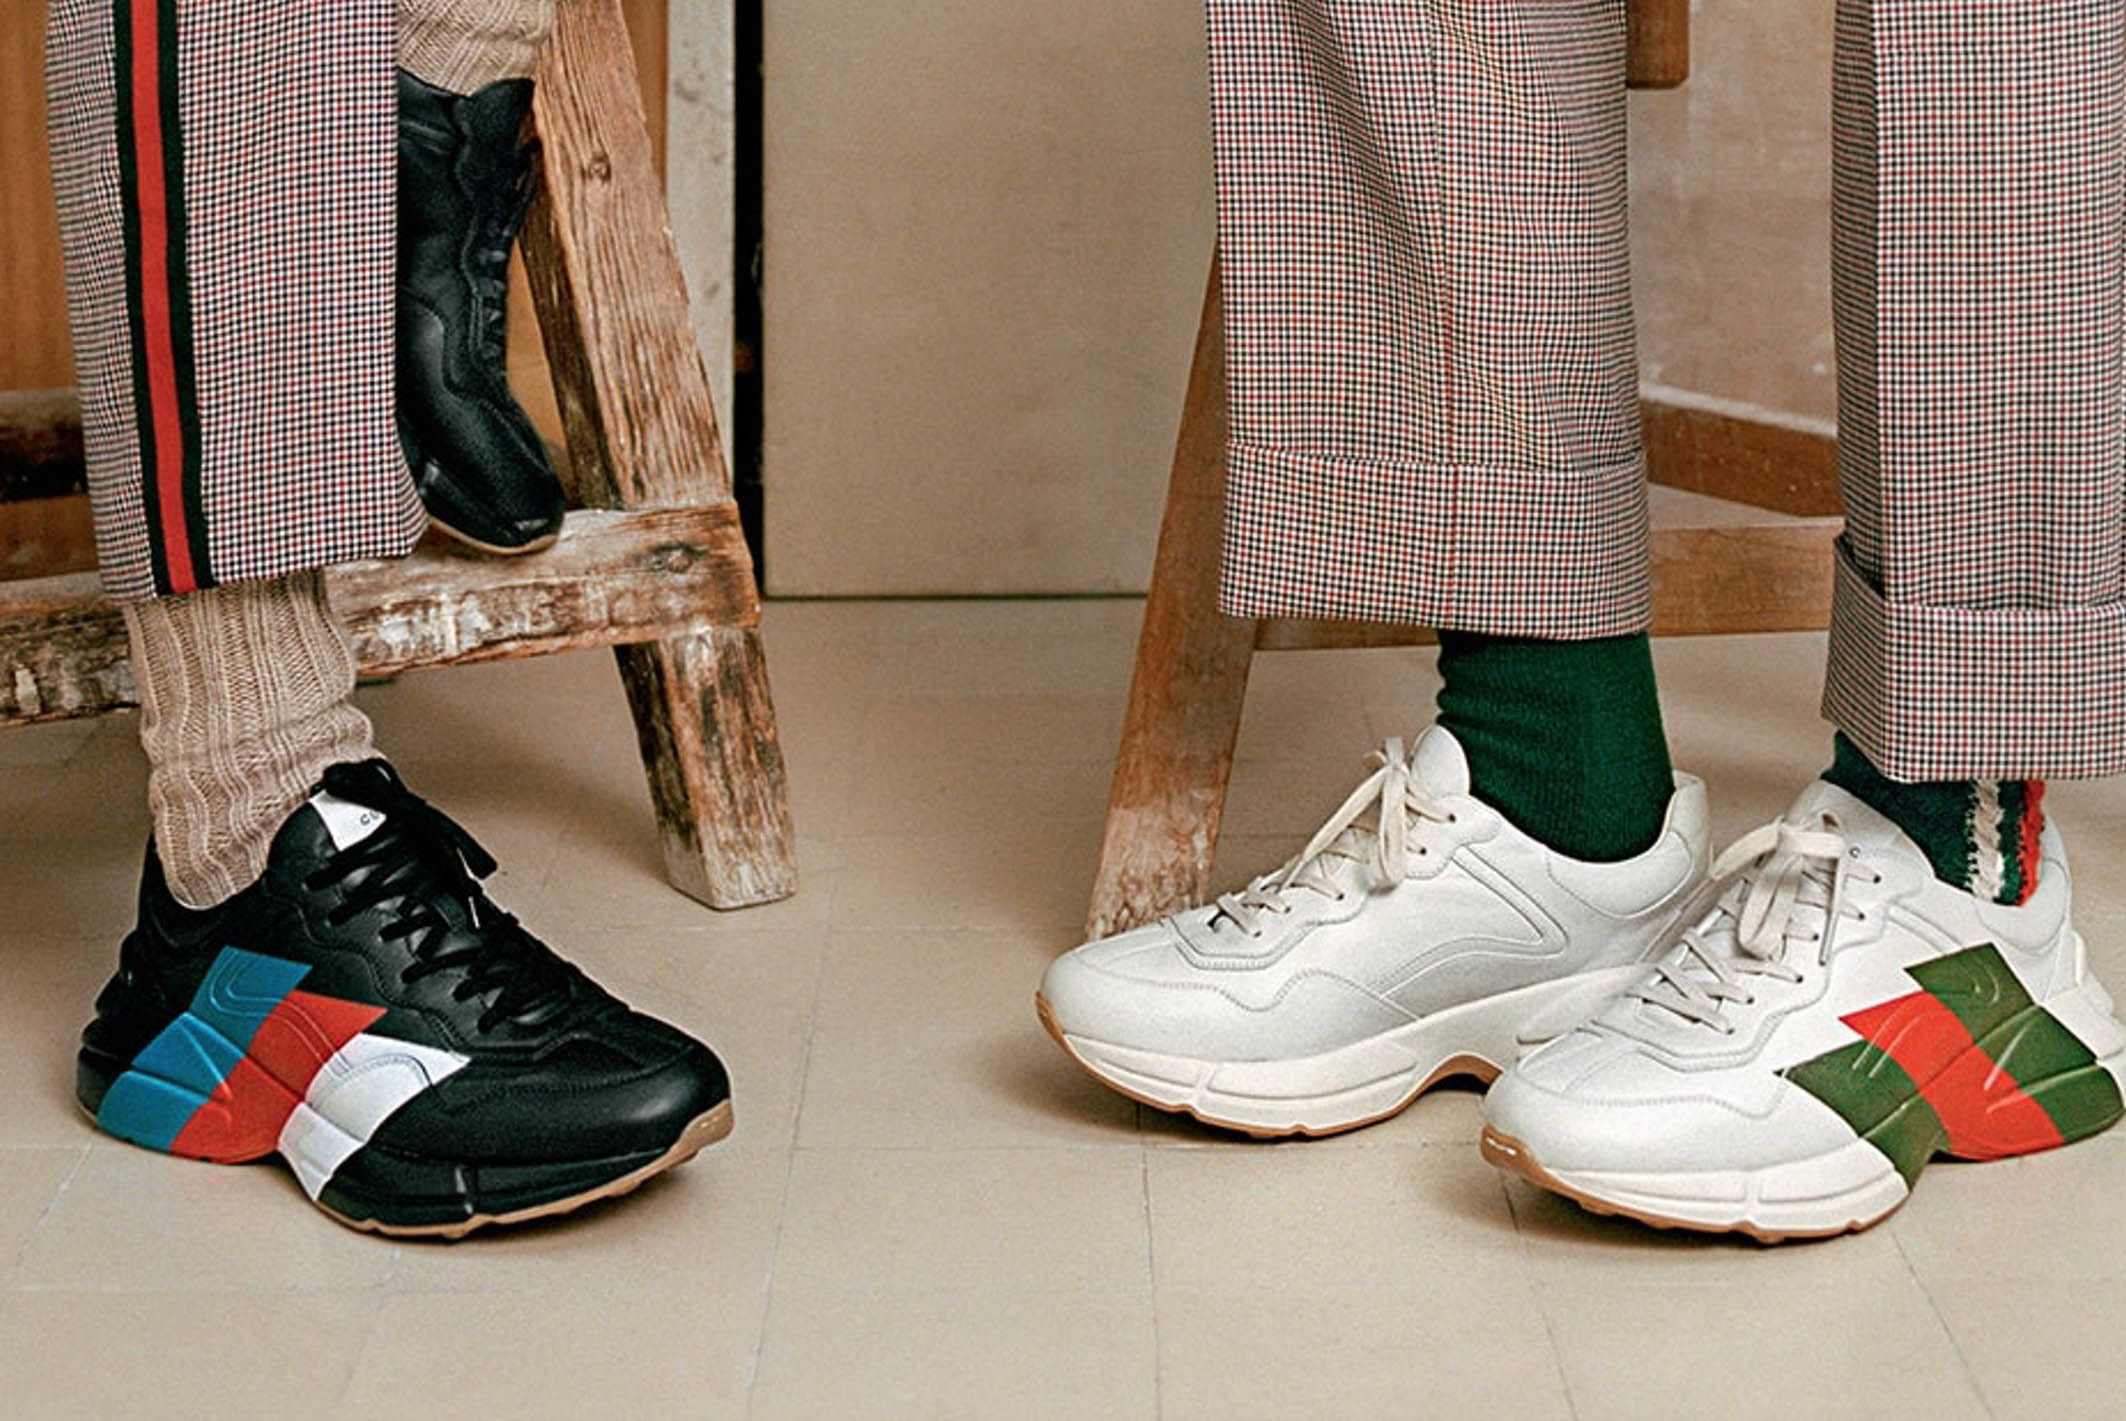 Gucci Rhyton Web Print Sneakers Black White Release 01 Sneaker Freaker